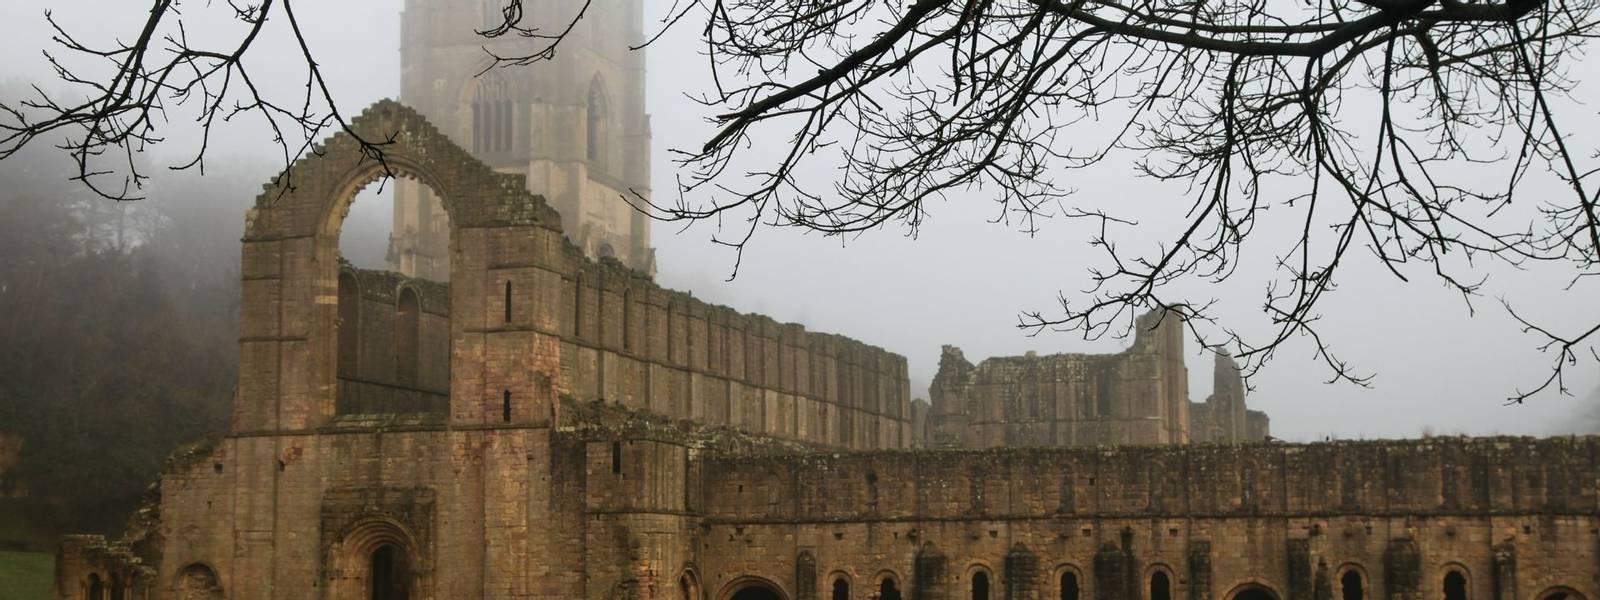 Southern Yorkshire Dales - Spring and Winter Walking - AdobeStock_153544688.jpeg